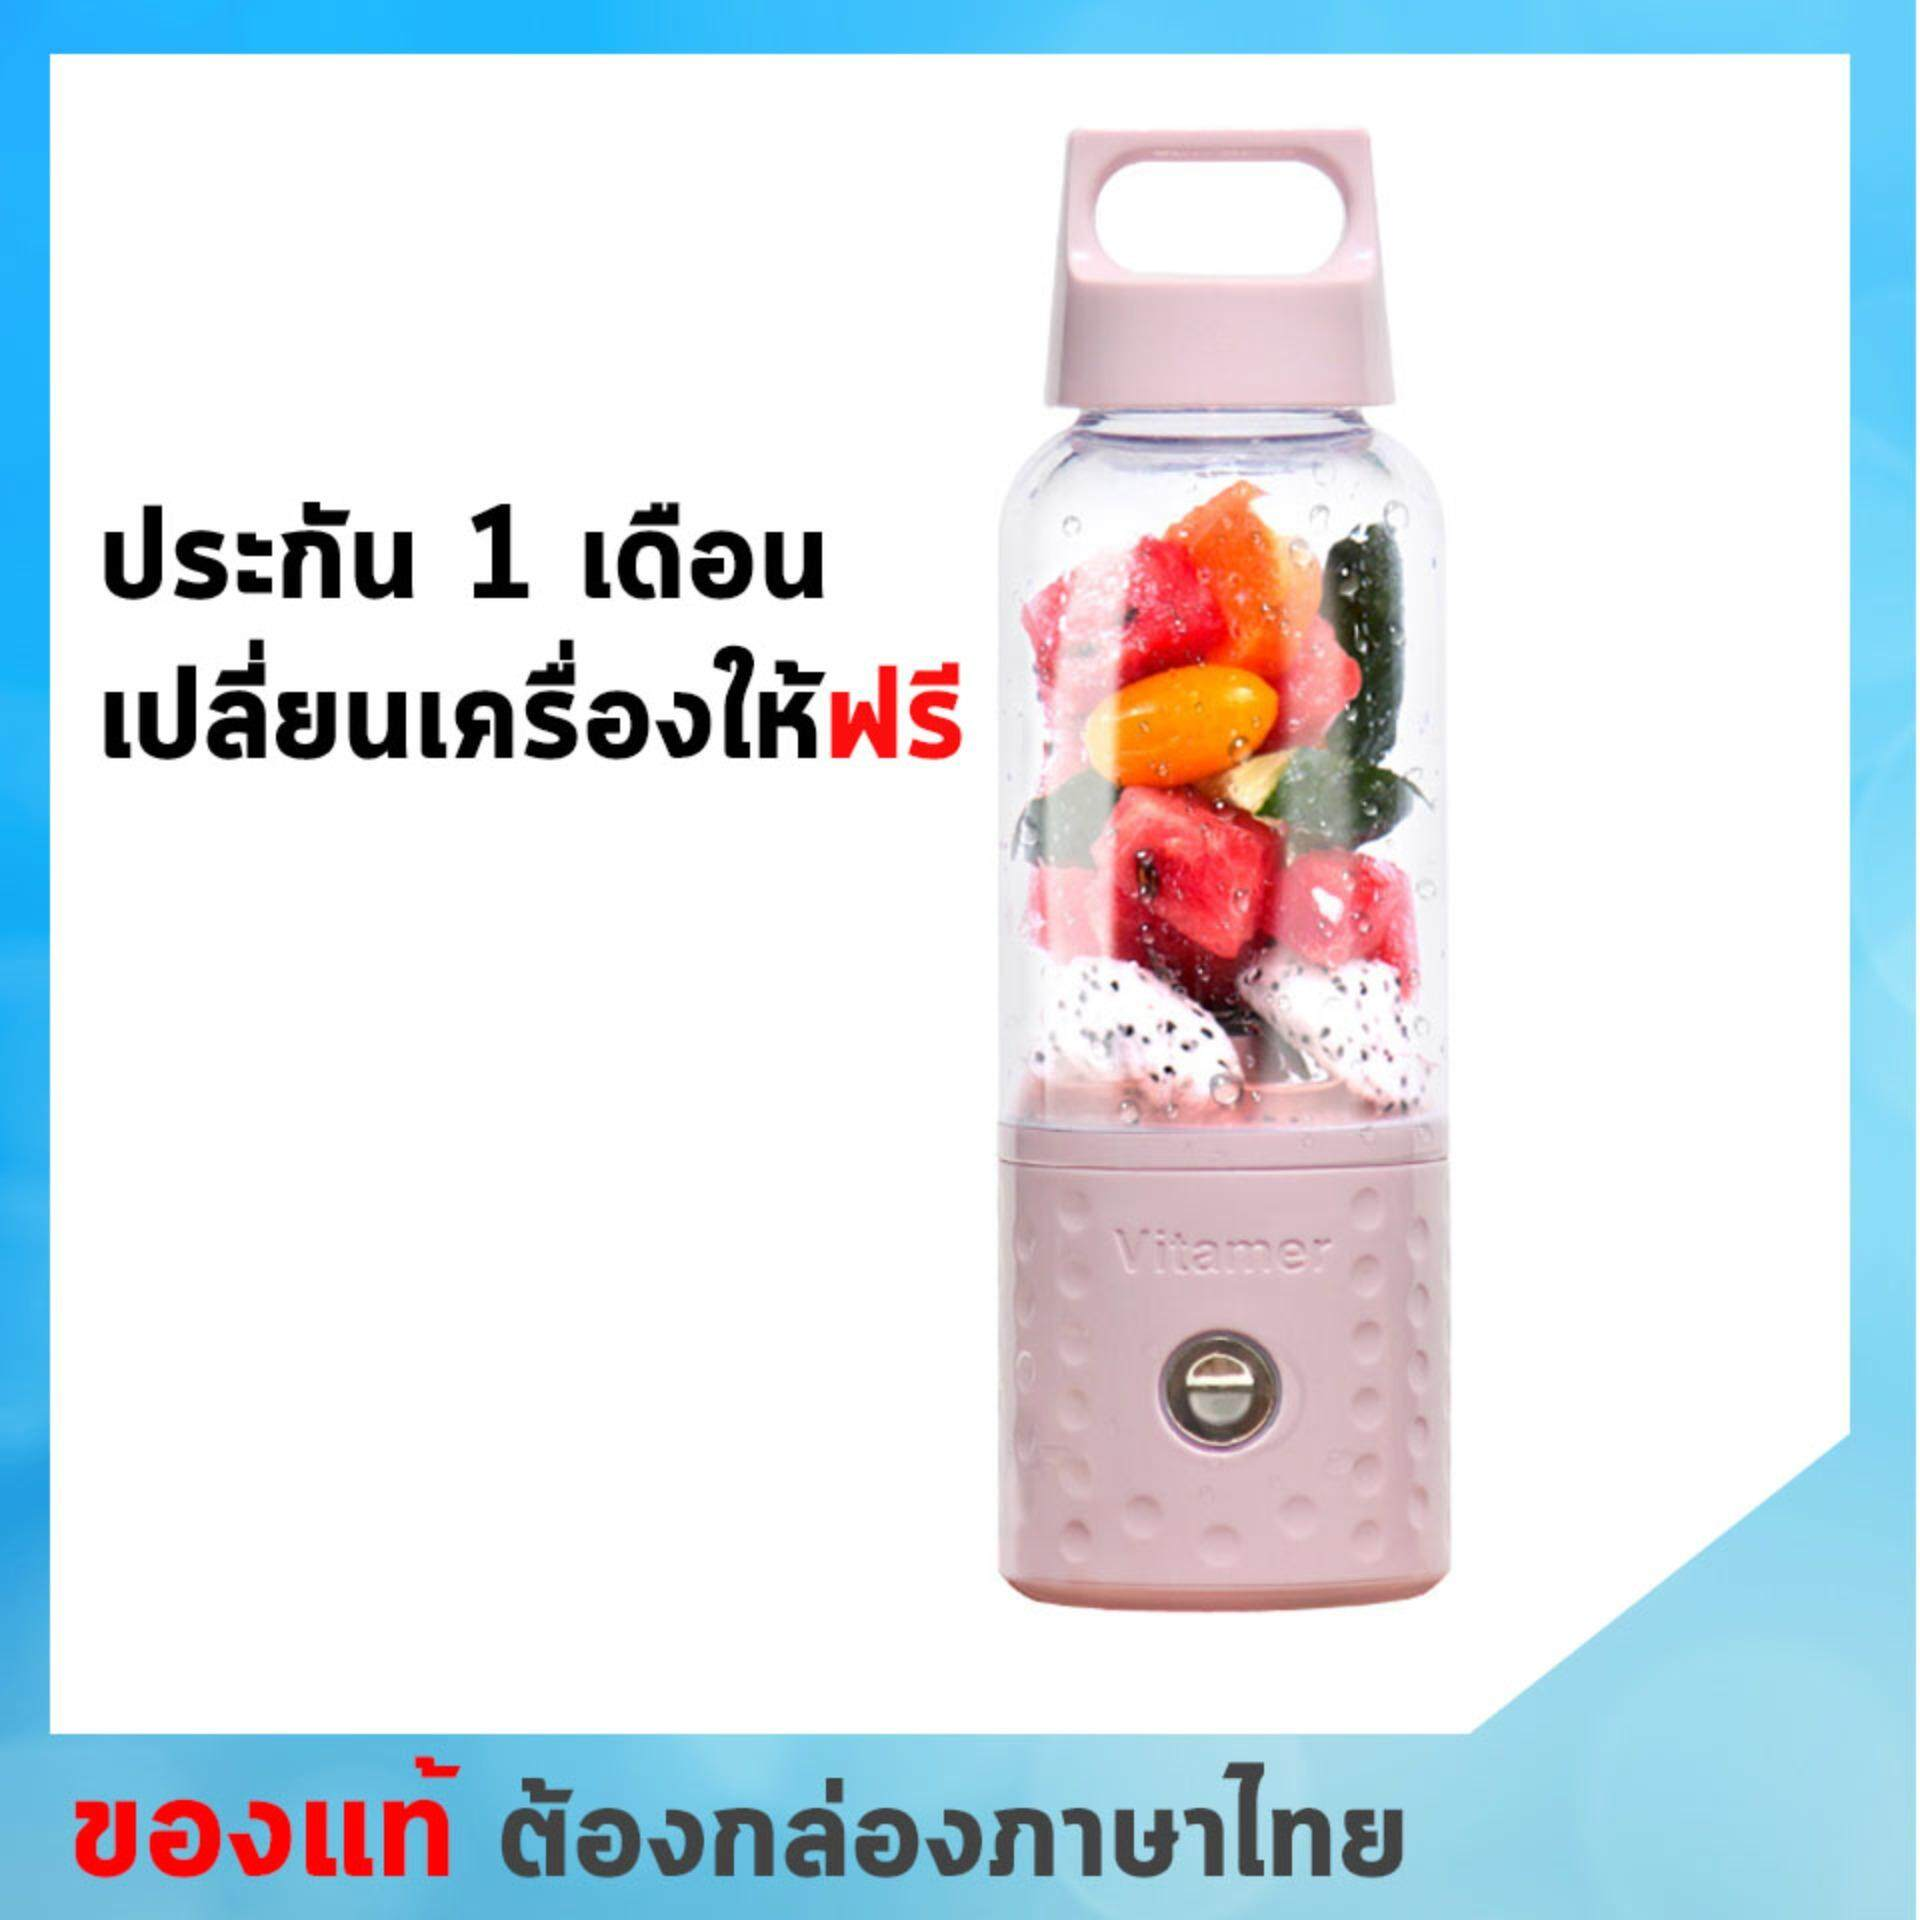 Vitamer แก้วปั่น พกพา (สีชมพู พร้อมส่ง จากไทย 100%) เครื่องปั่น ปั่นน้ำผลไม้ 500 ml